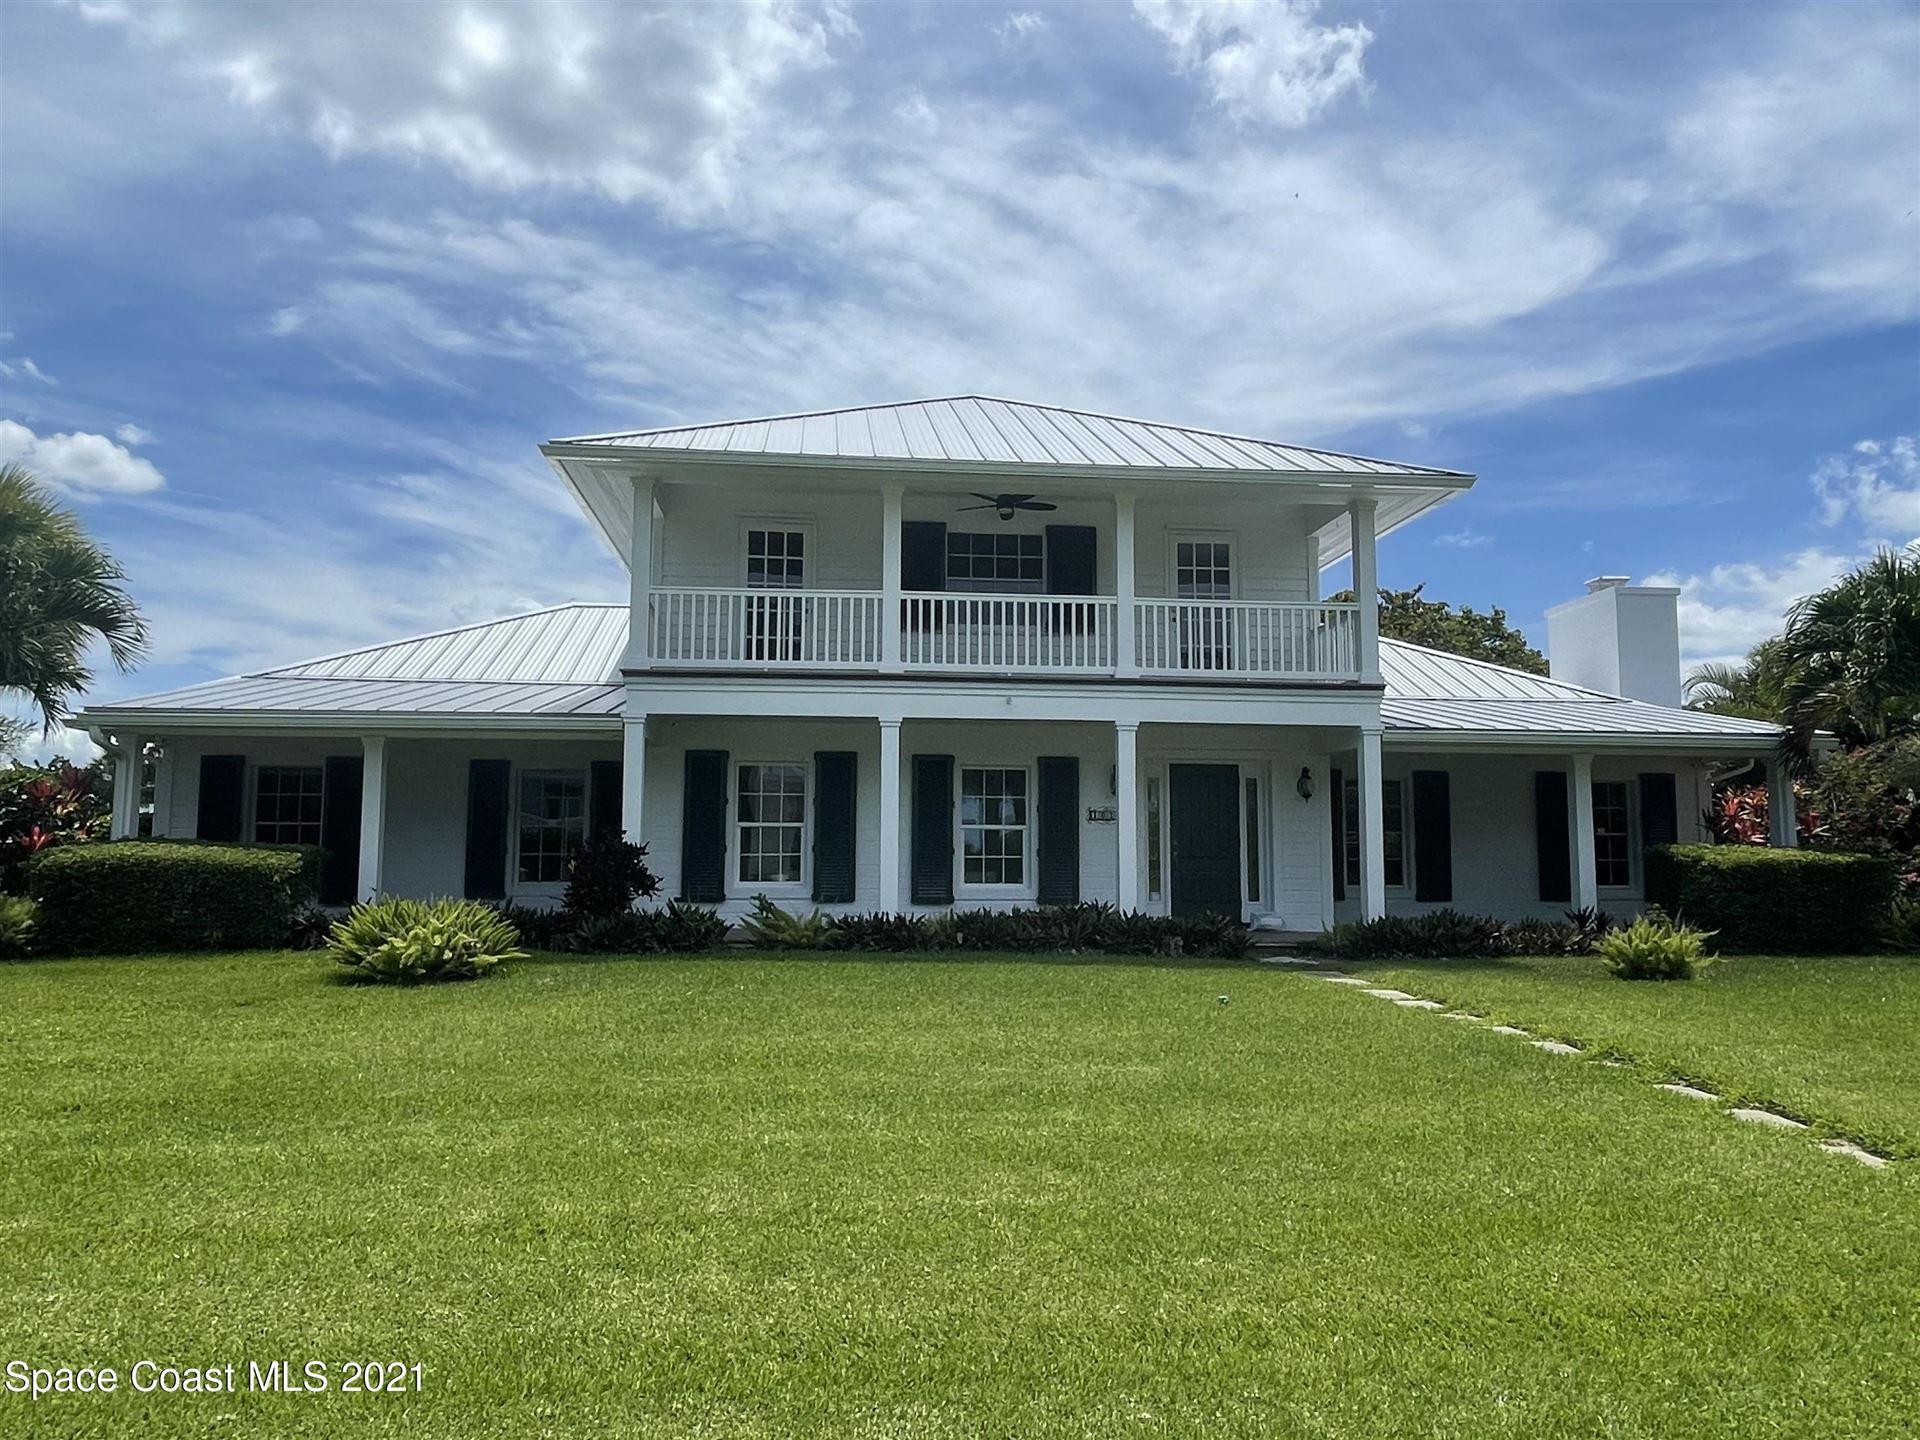 1013 Olde Doubloon Drive, Vero Beach, FL 32963 - #: 907758